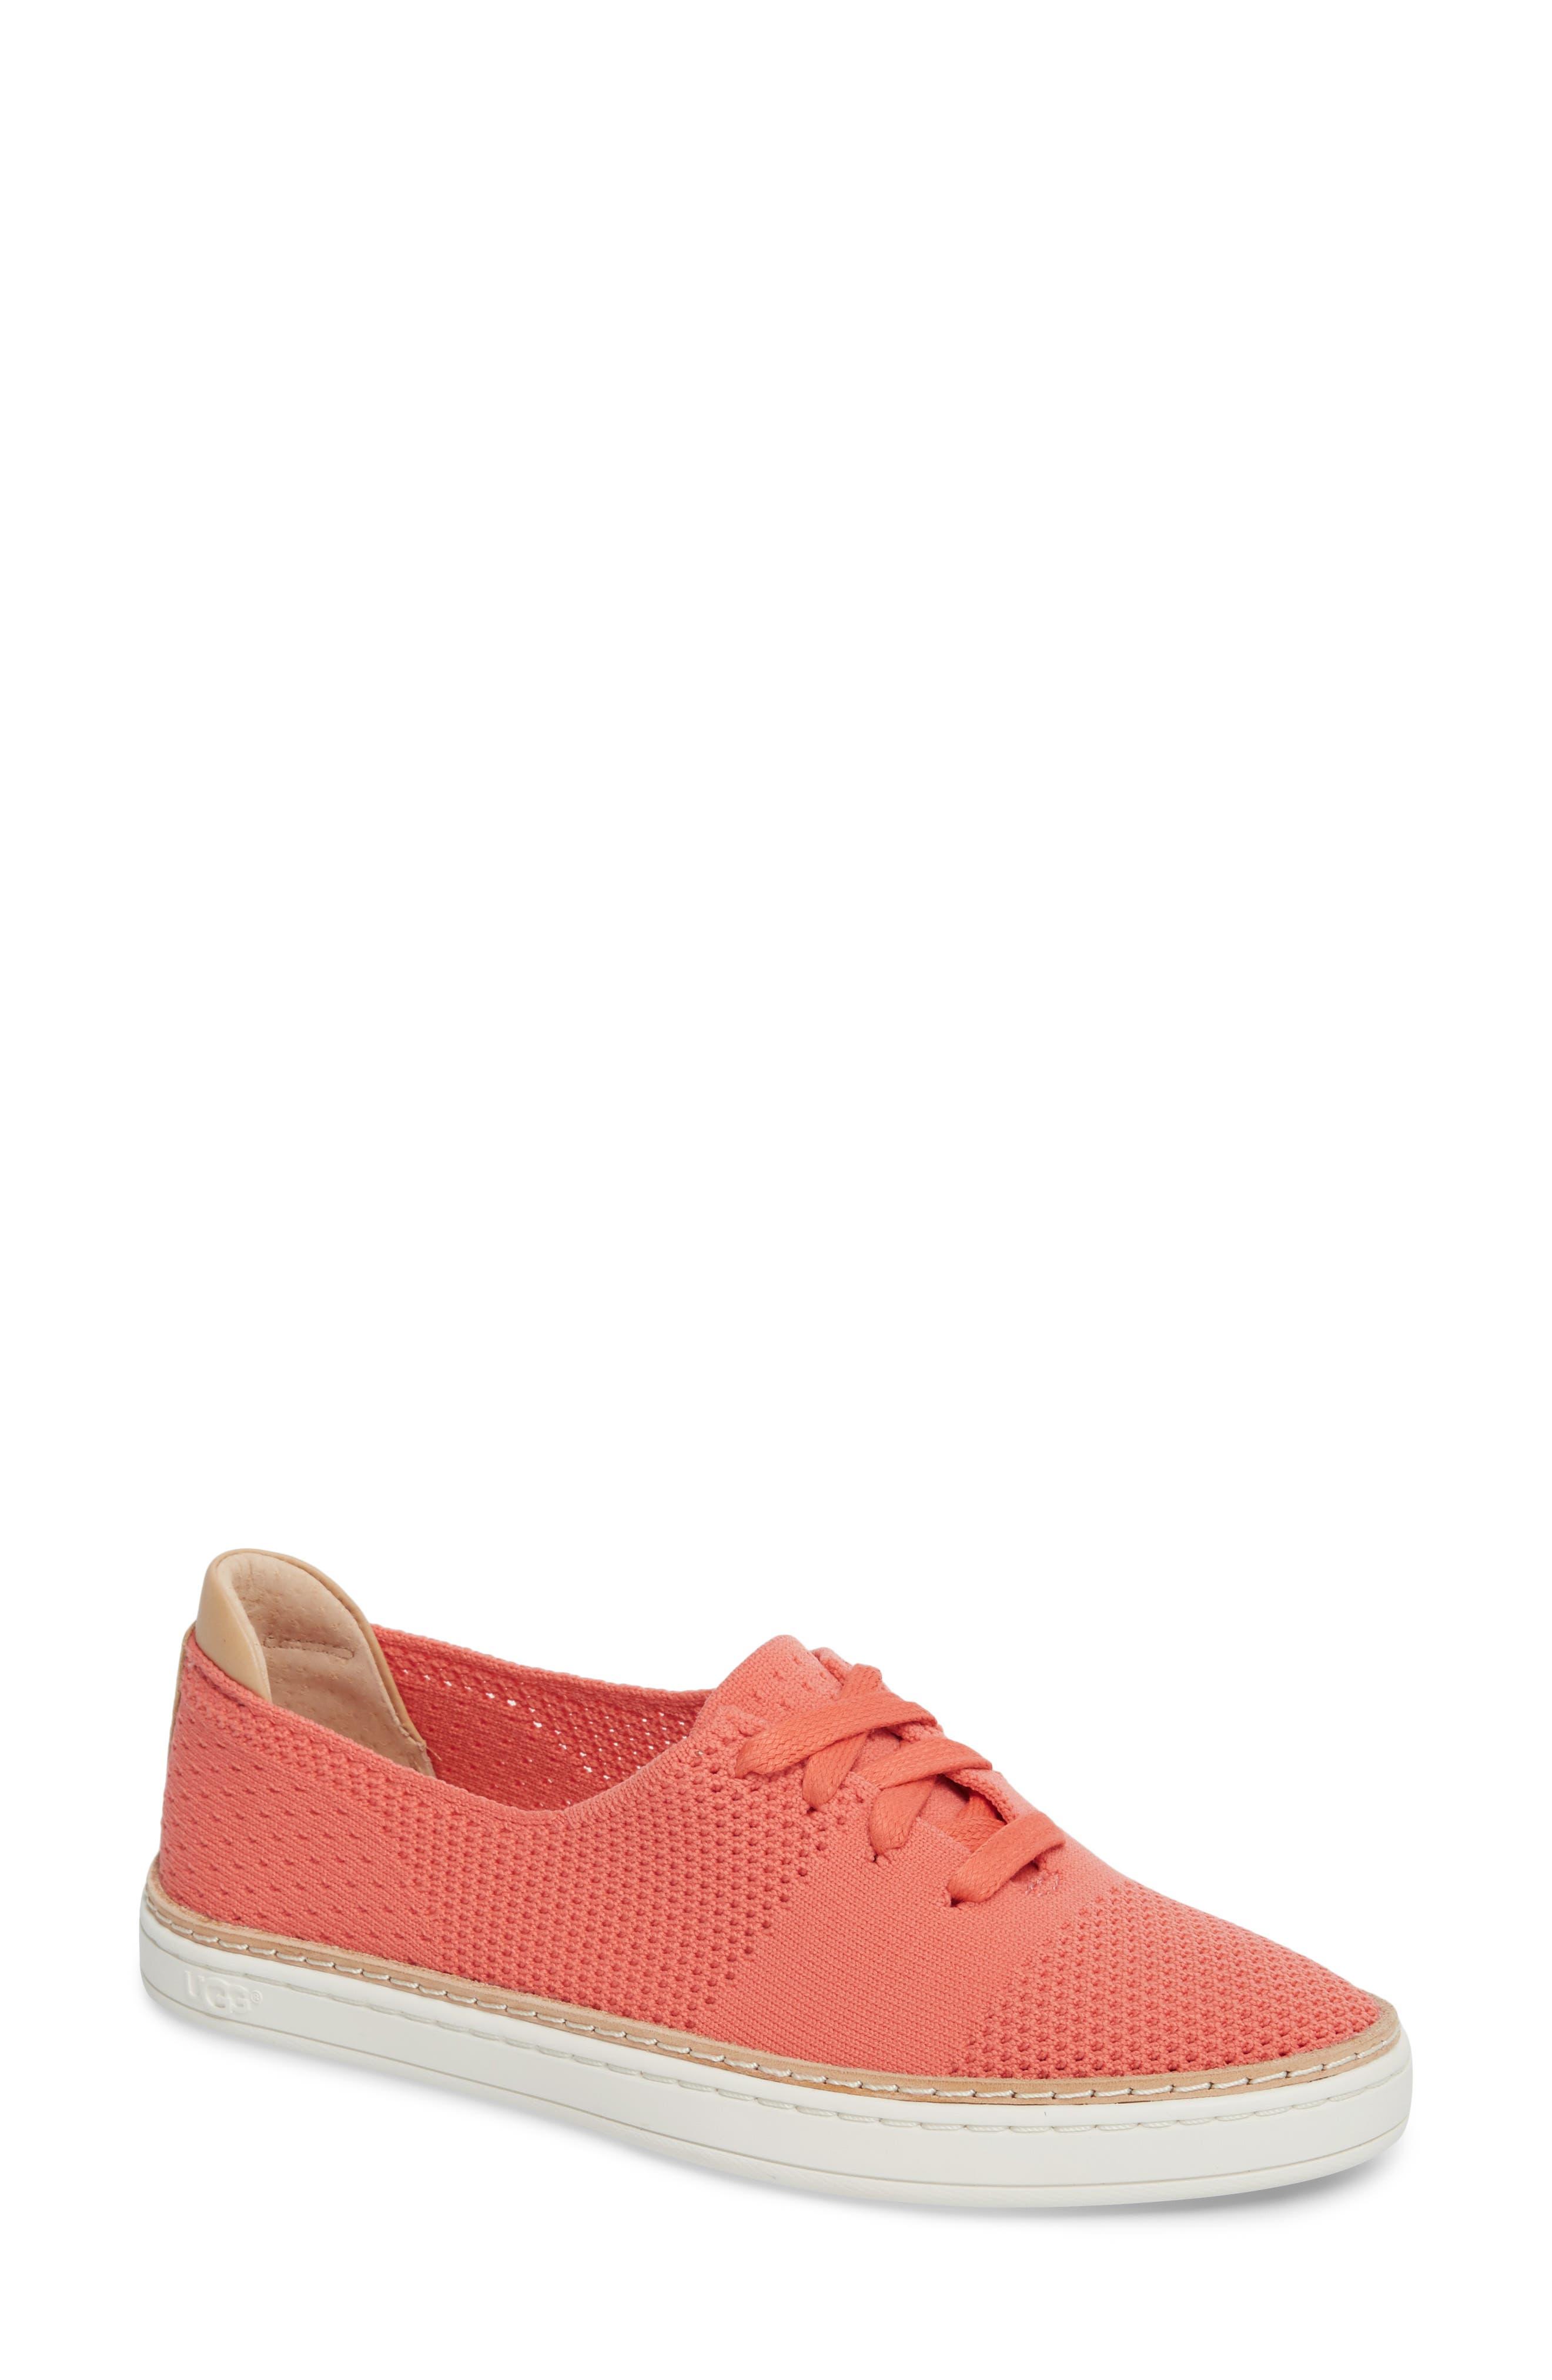 Pinkett Sneaker,                         Main,                         color, VIBRANT CORAL